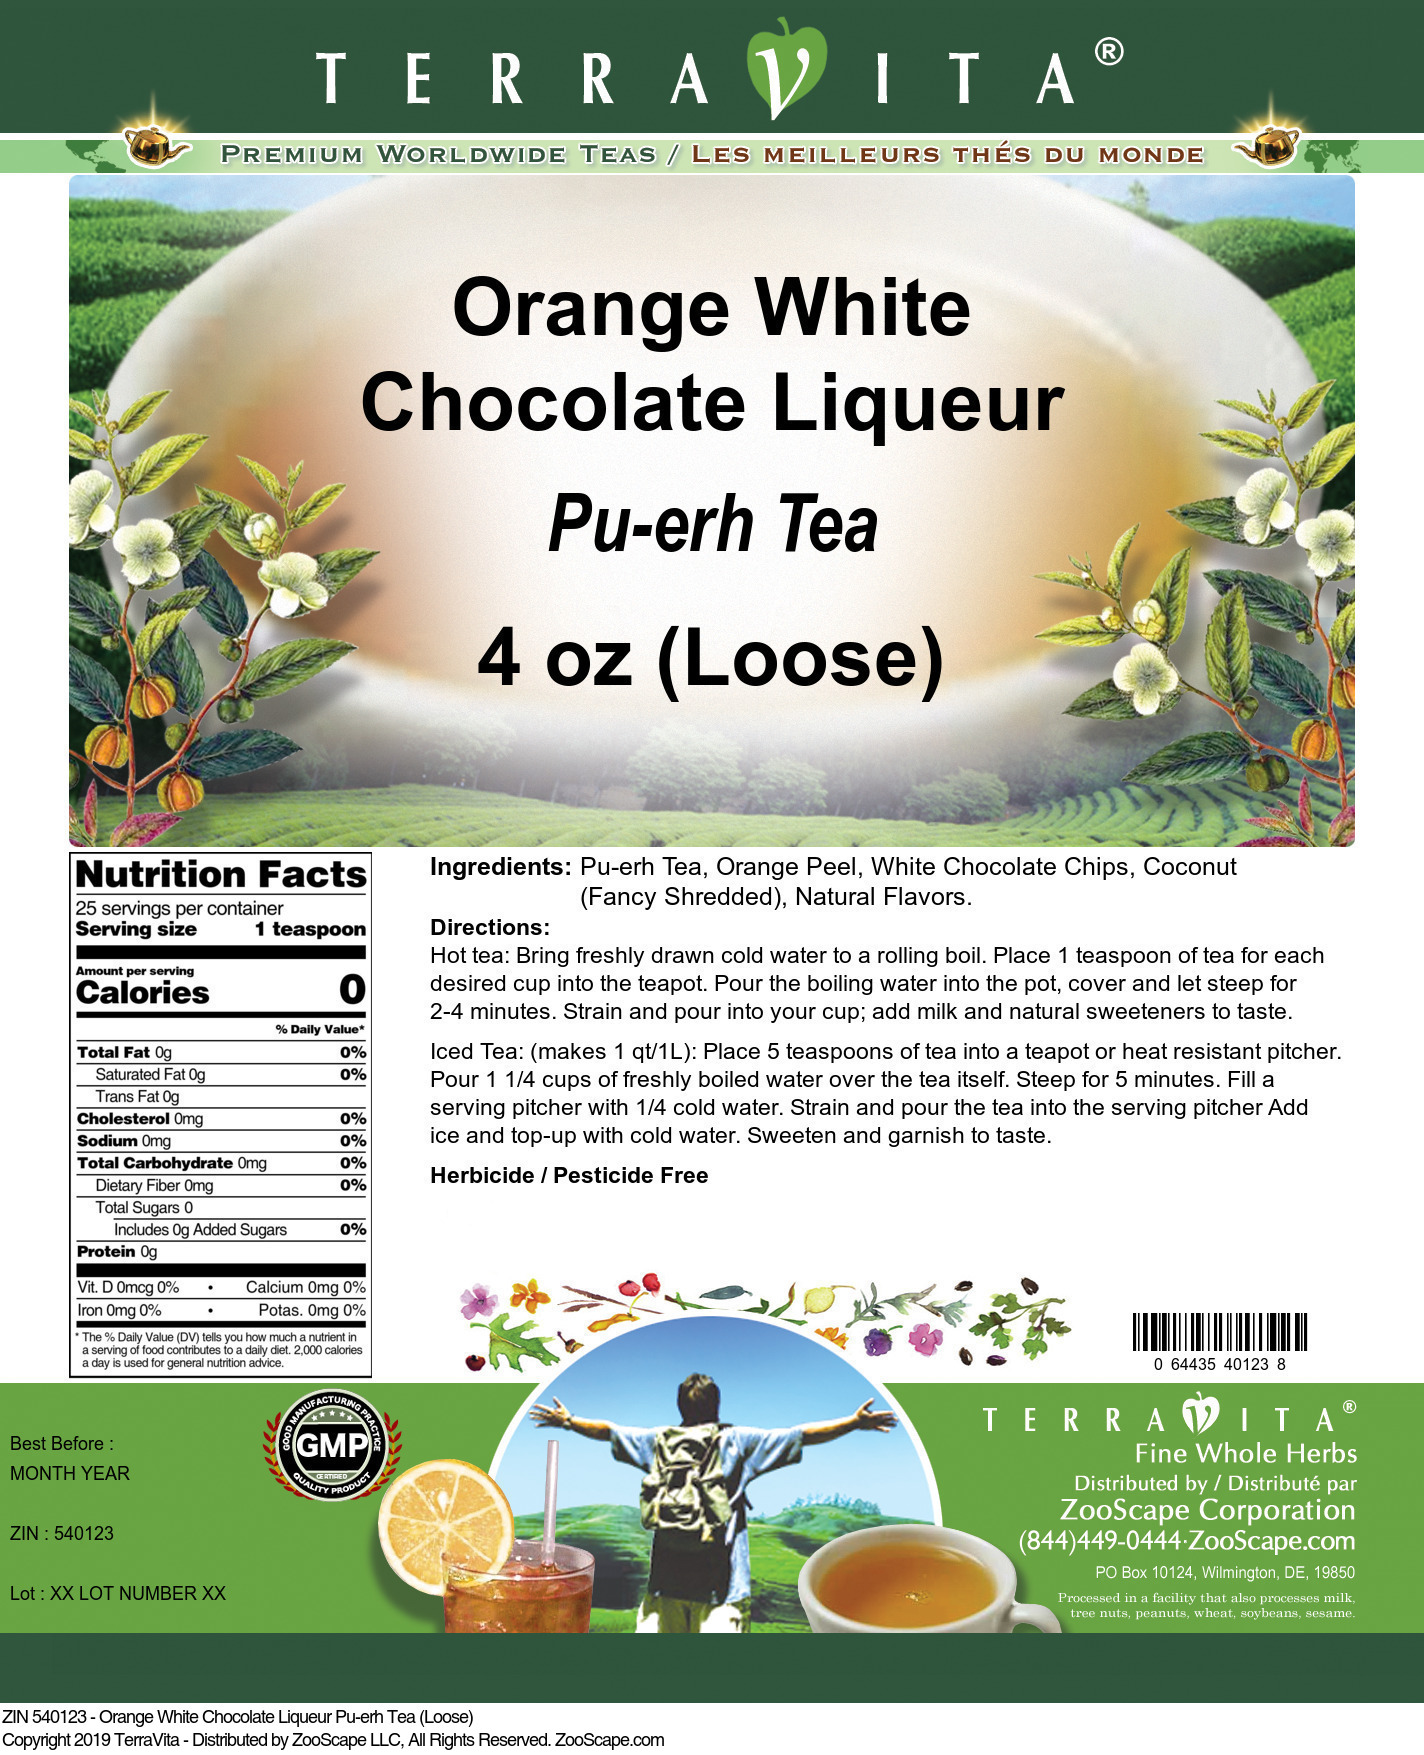 Orange White Chocolate Liqueur Pu-erh Tea